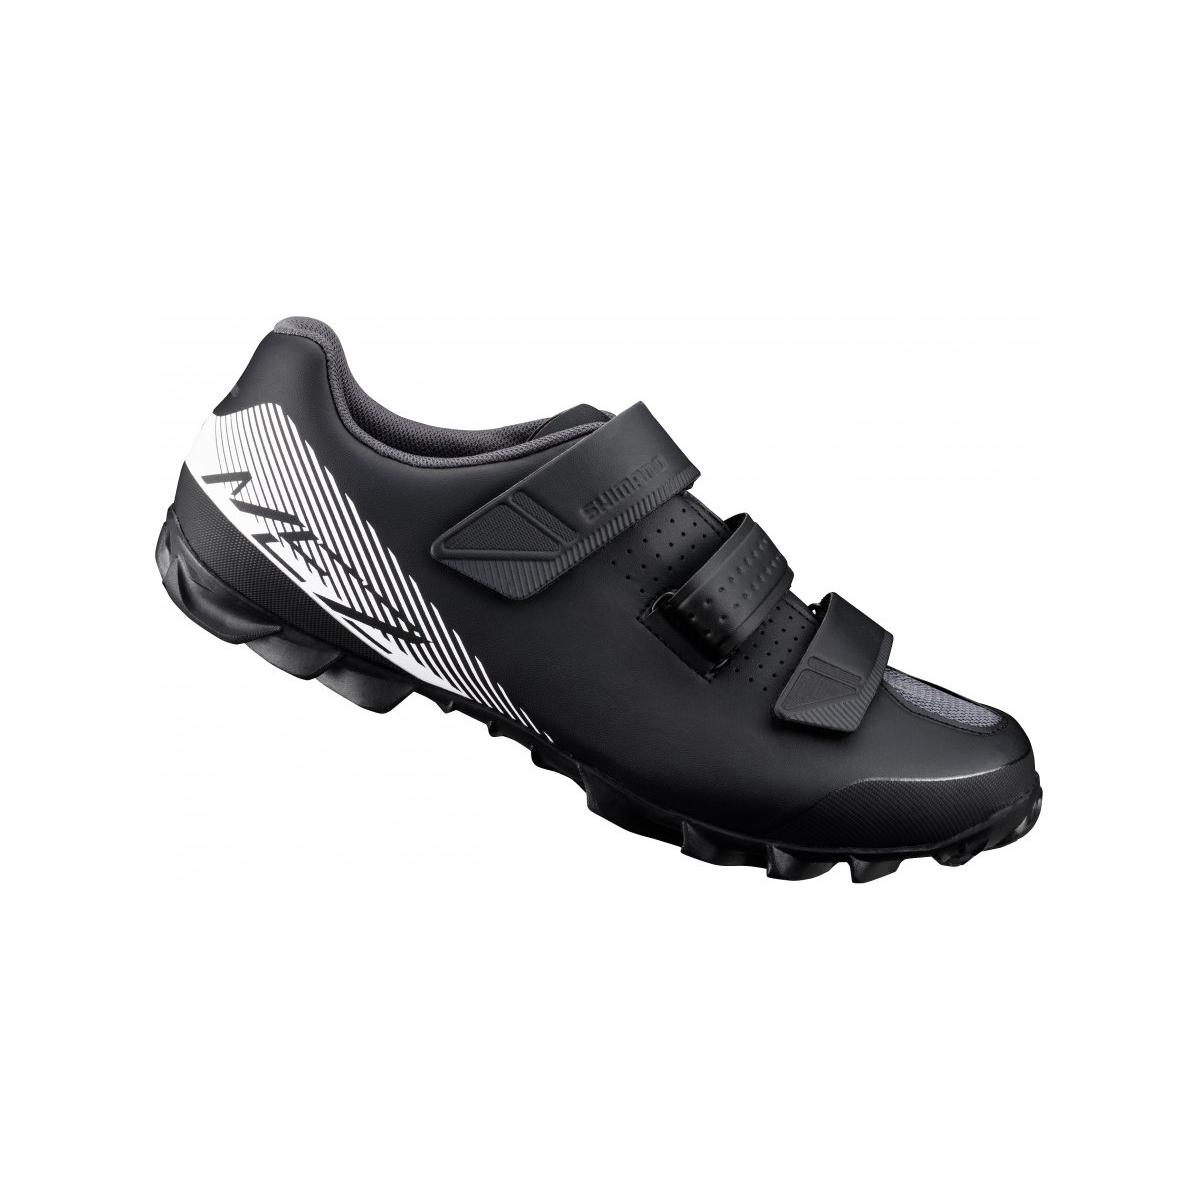 Shimano (ME2) MTB Shoe